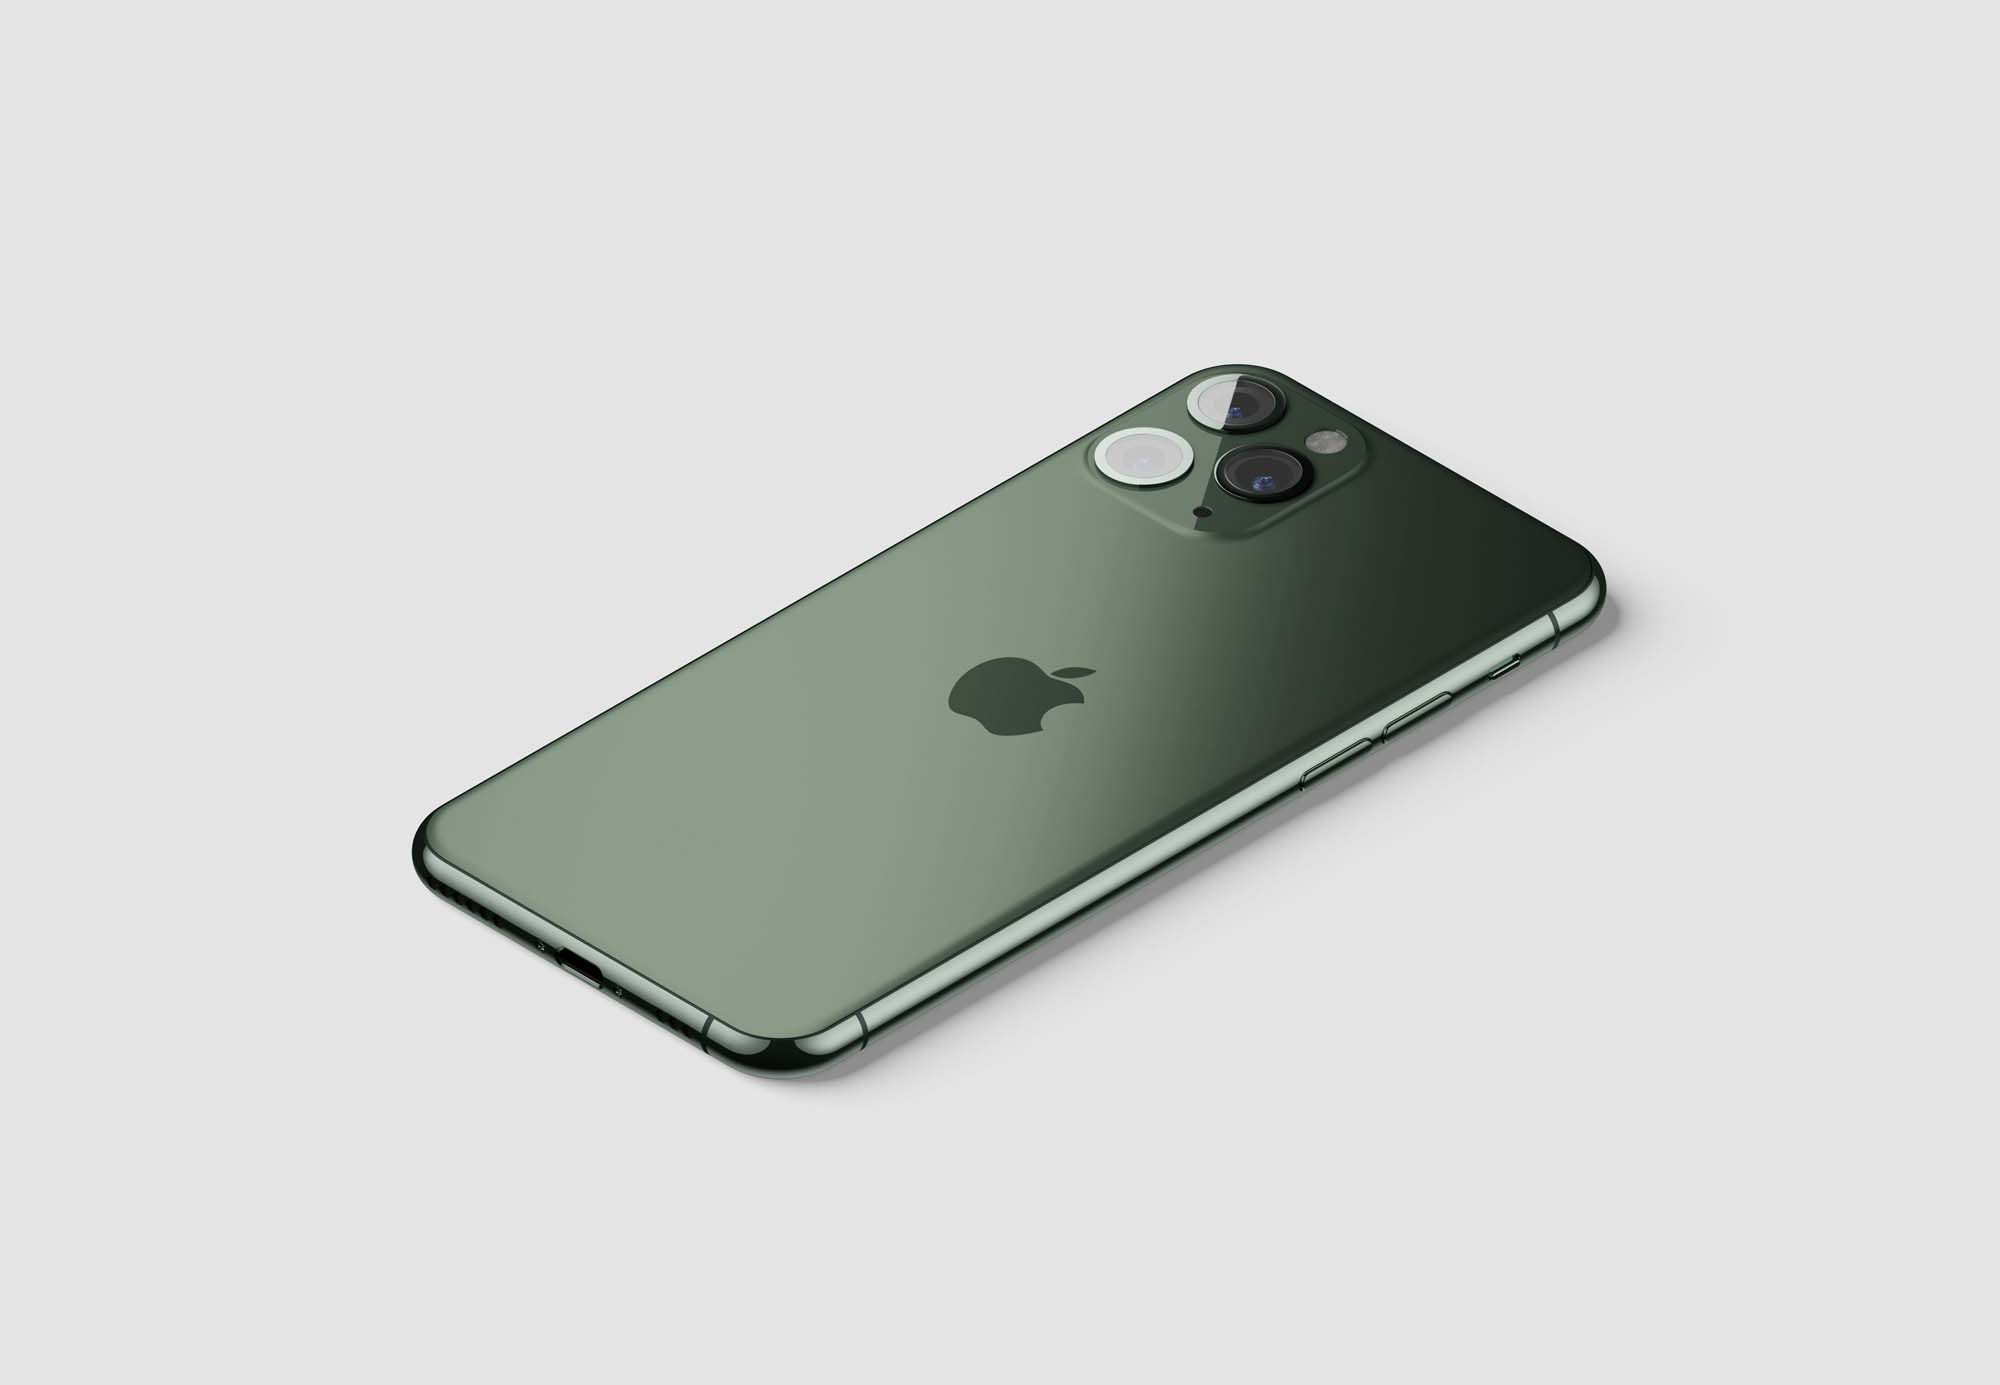 iPhone 11 Pro Max Mockup 2